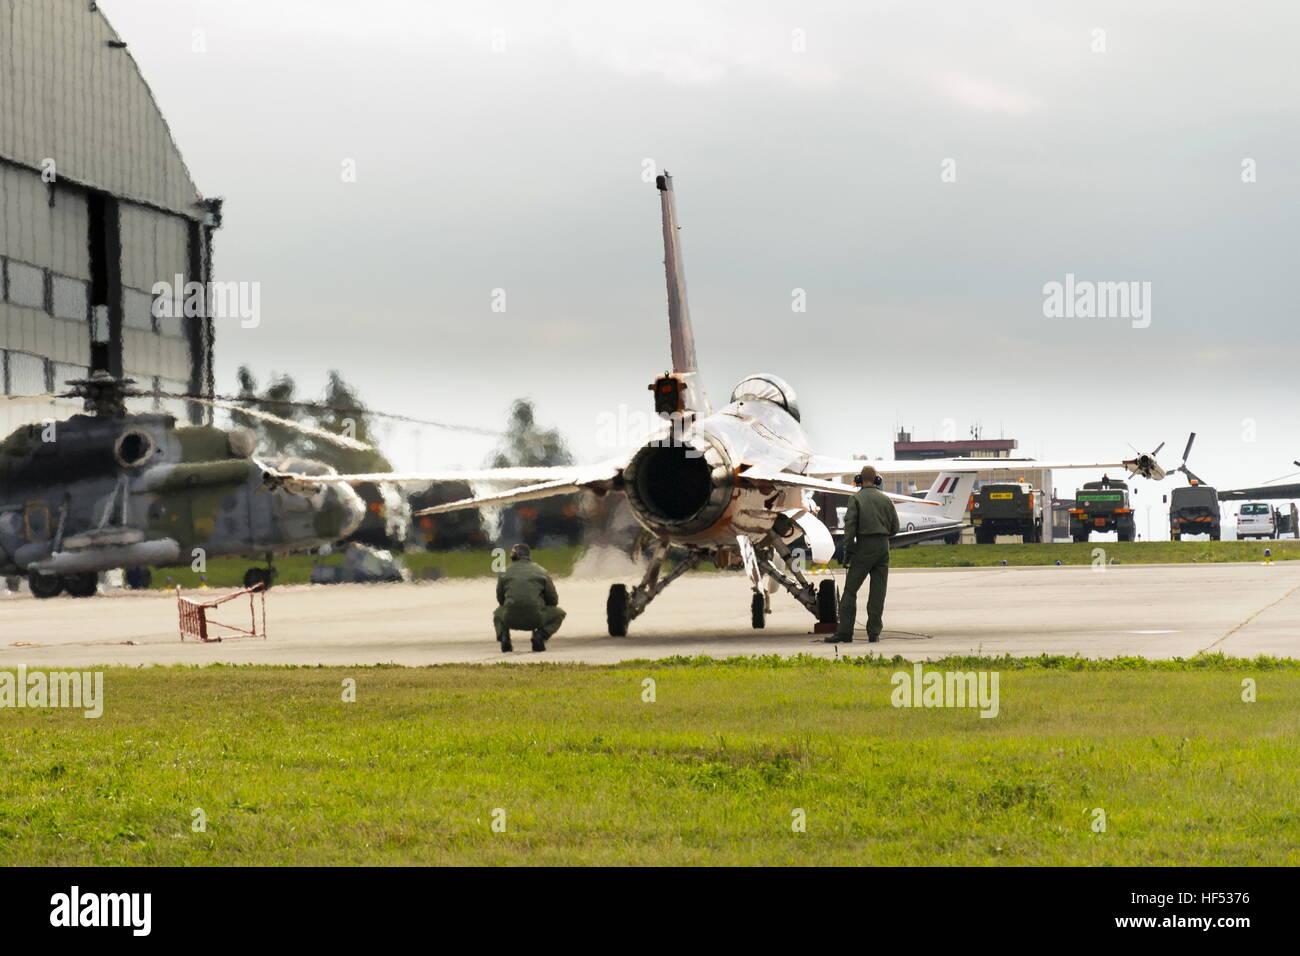 Men test J-015 Royal Netherlands Air Force Lockheed Martin F-16AM Fighting Falcon jet - Stock Image